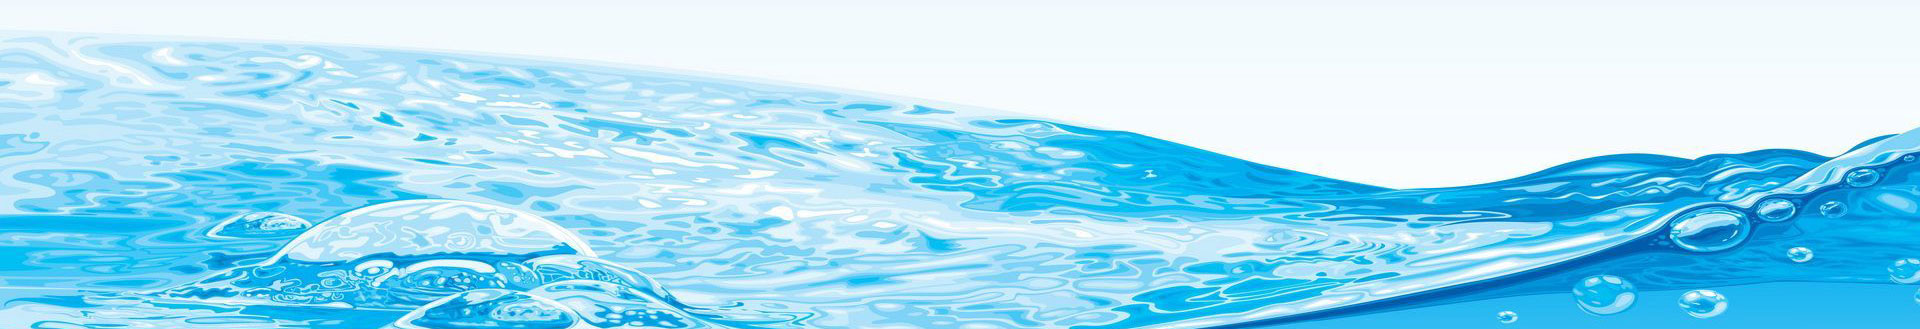 my-water - מיני בר מים לבית ולעסק